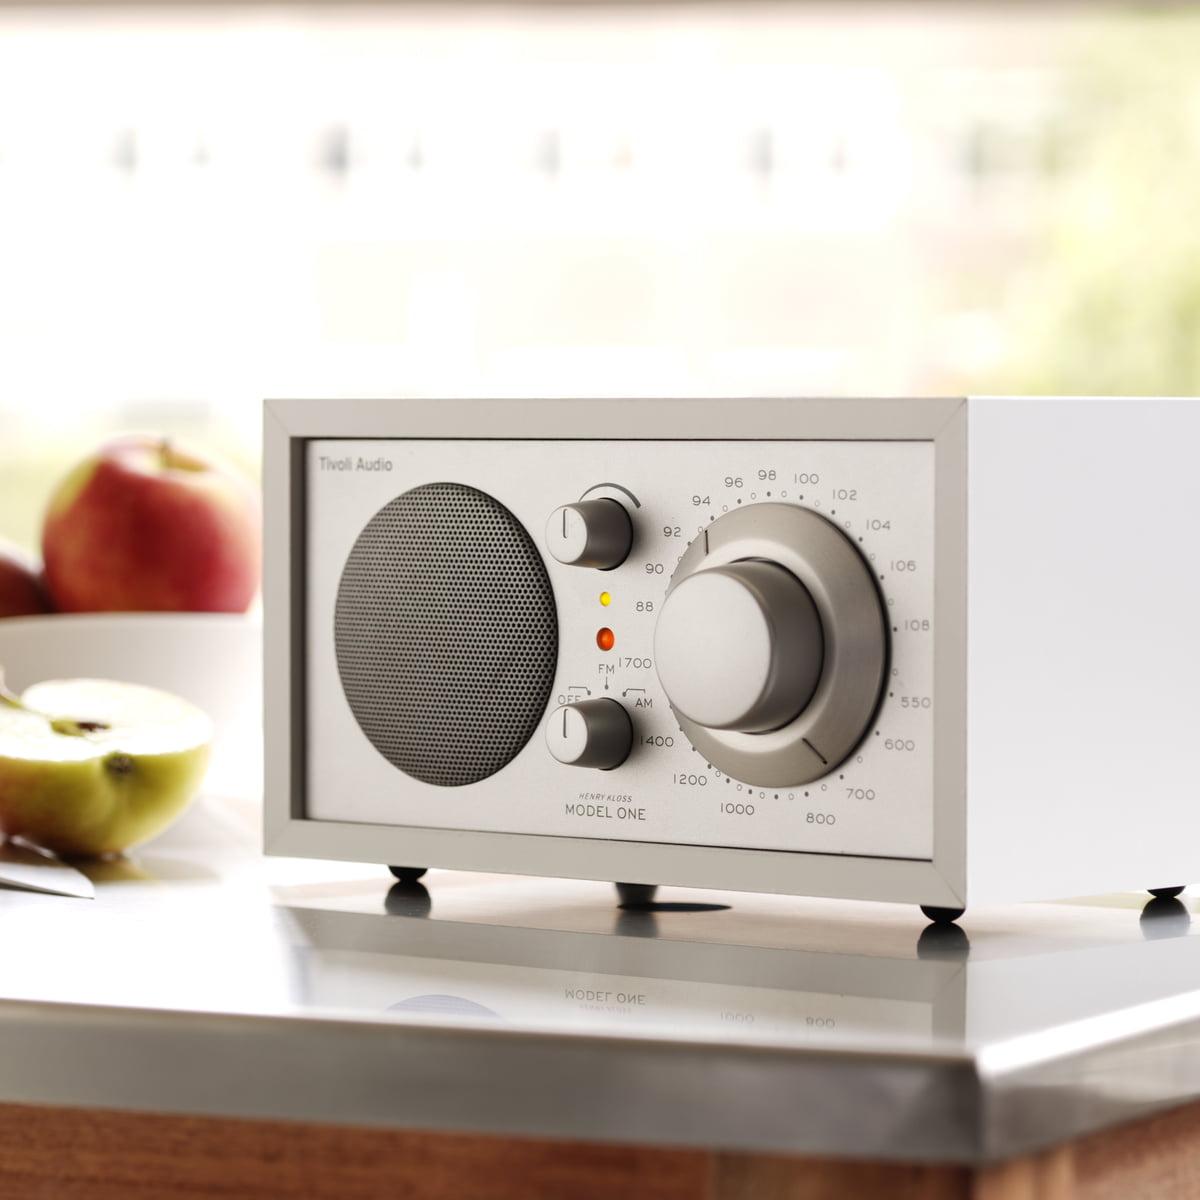 model one mono radio von tivoli audio connox. Black Bedroom Furniture Sets. Home Design Ideas